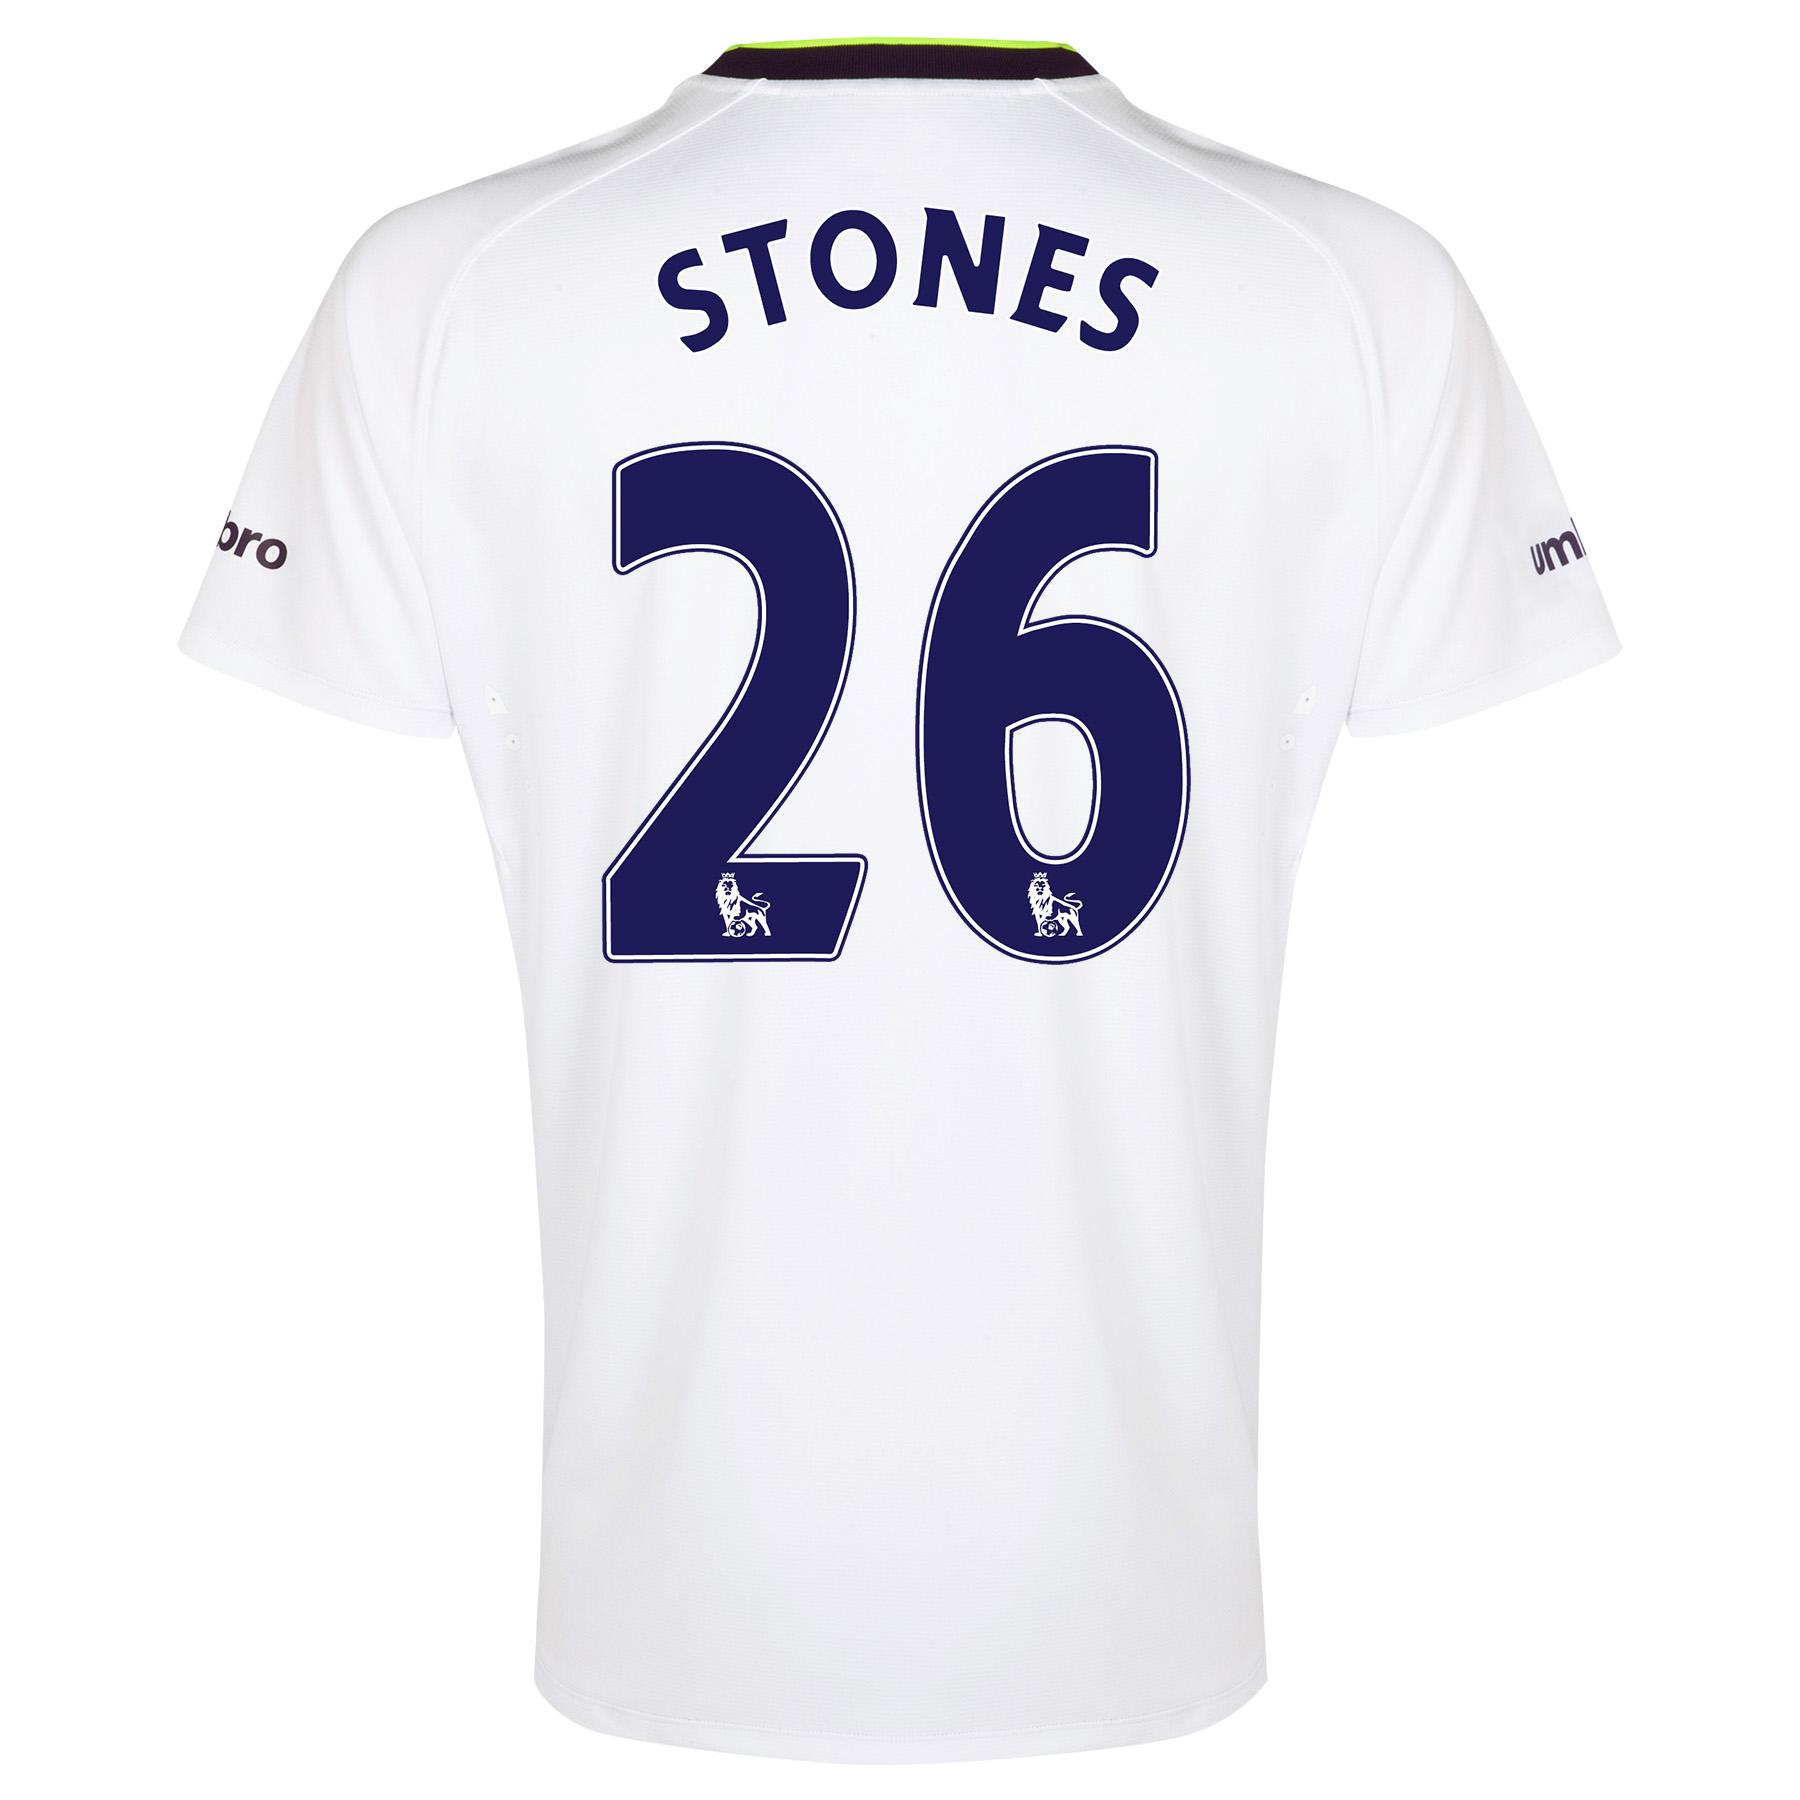 Everton SS 3rd Shirt 2014/15 - Junior with Stones 26 printing